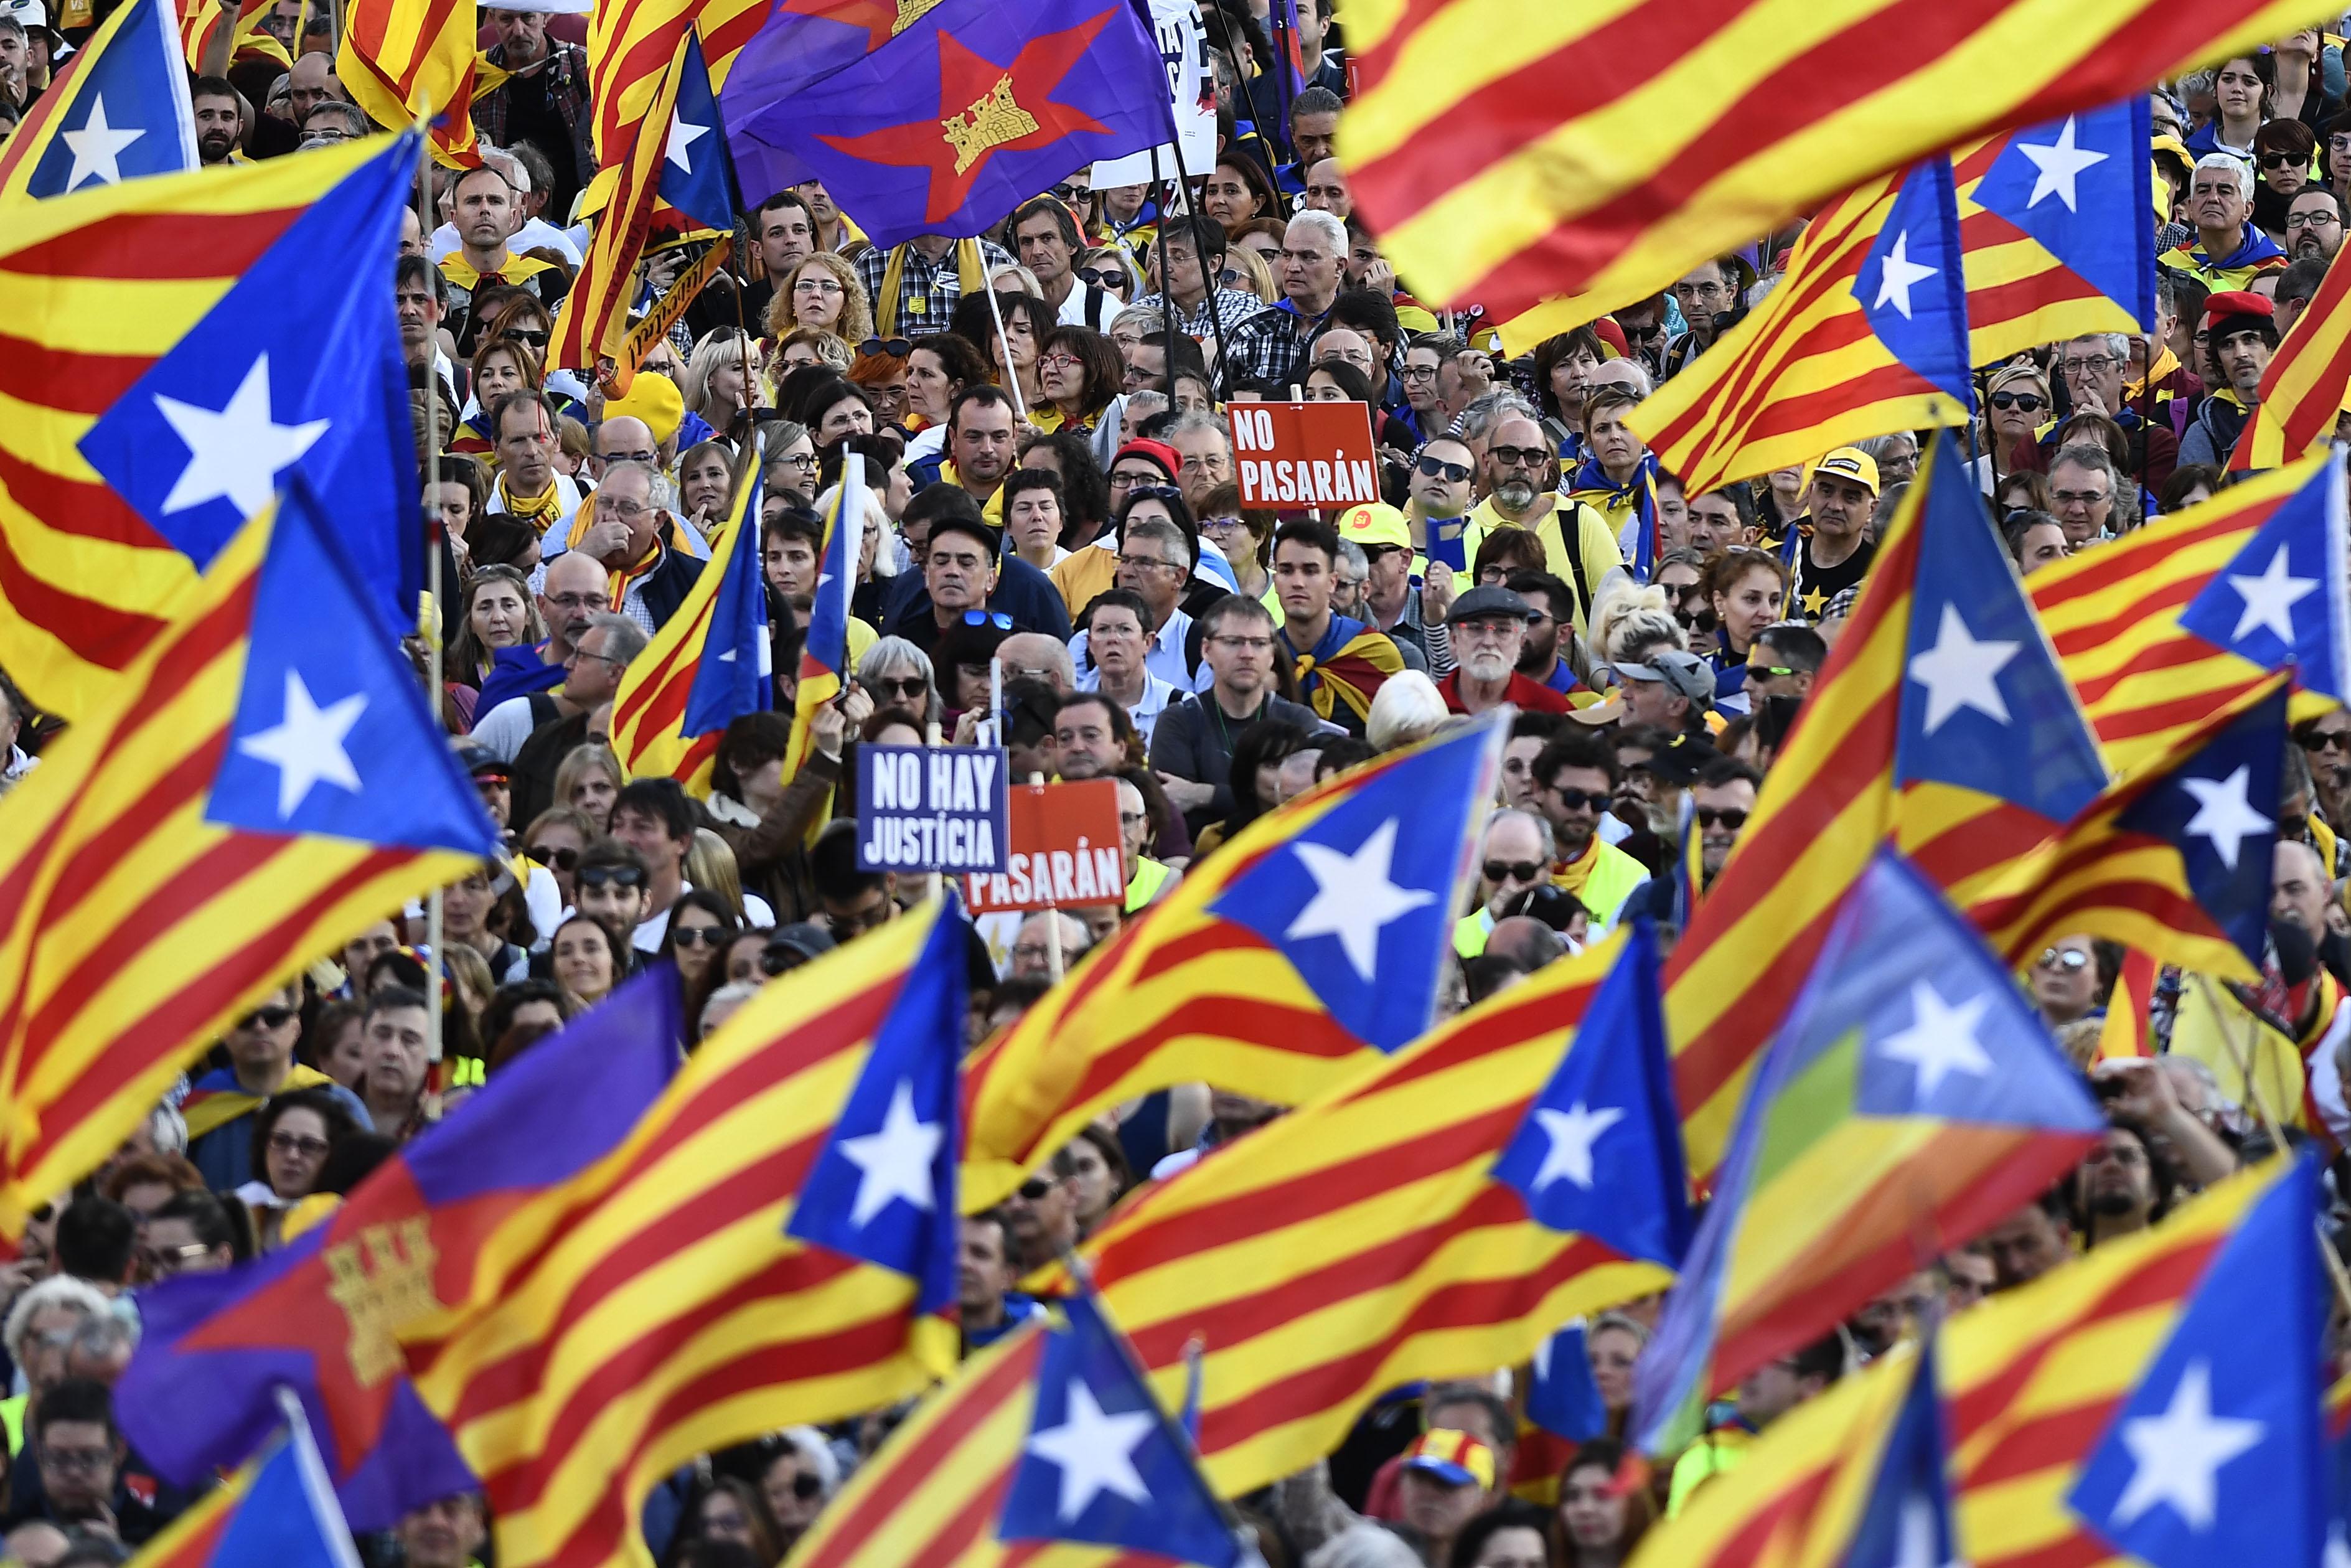 Телефон спикера парламента Каталонии был взломан через WhatsApp